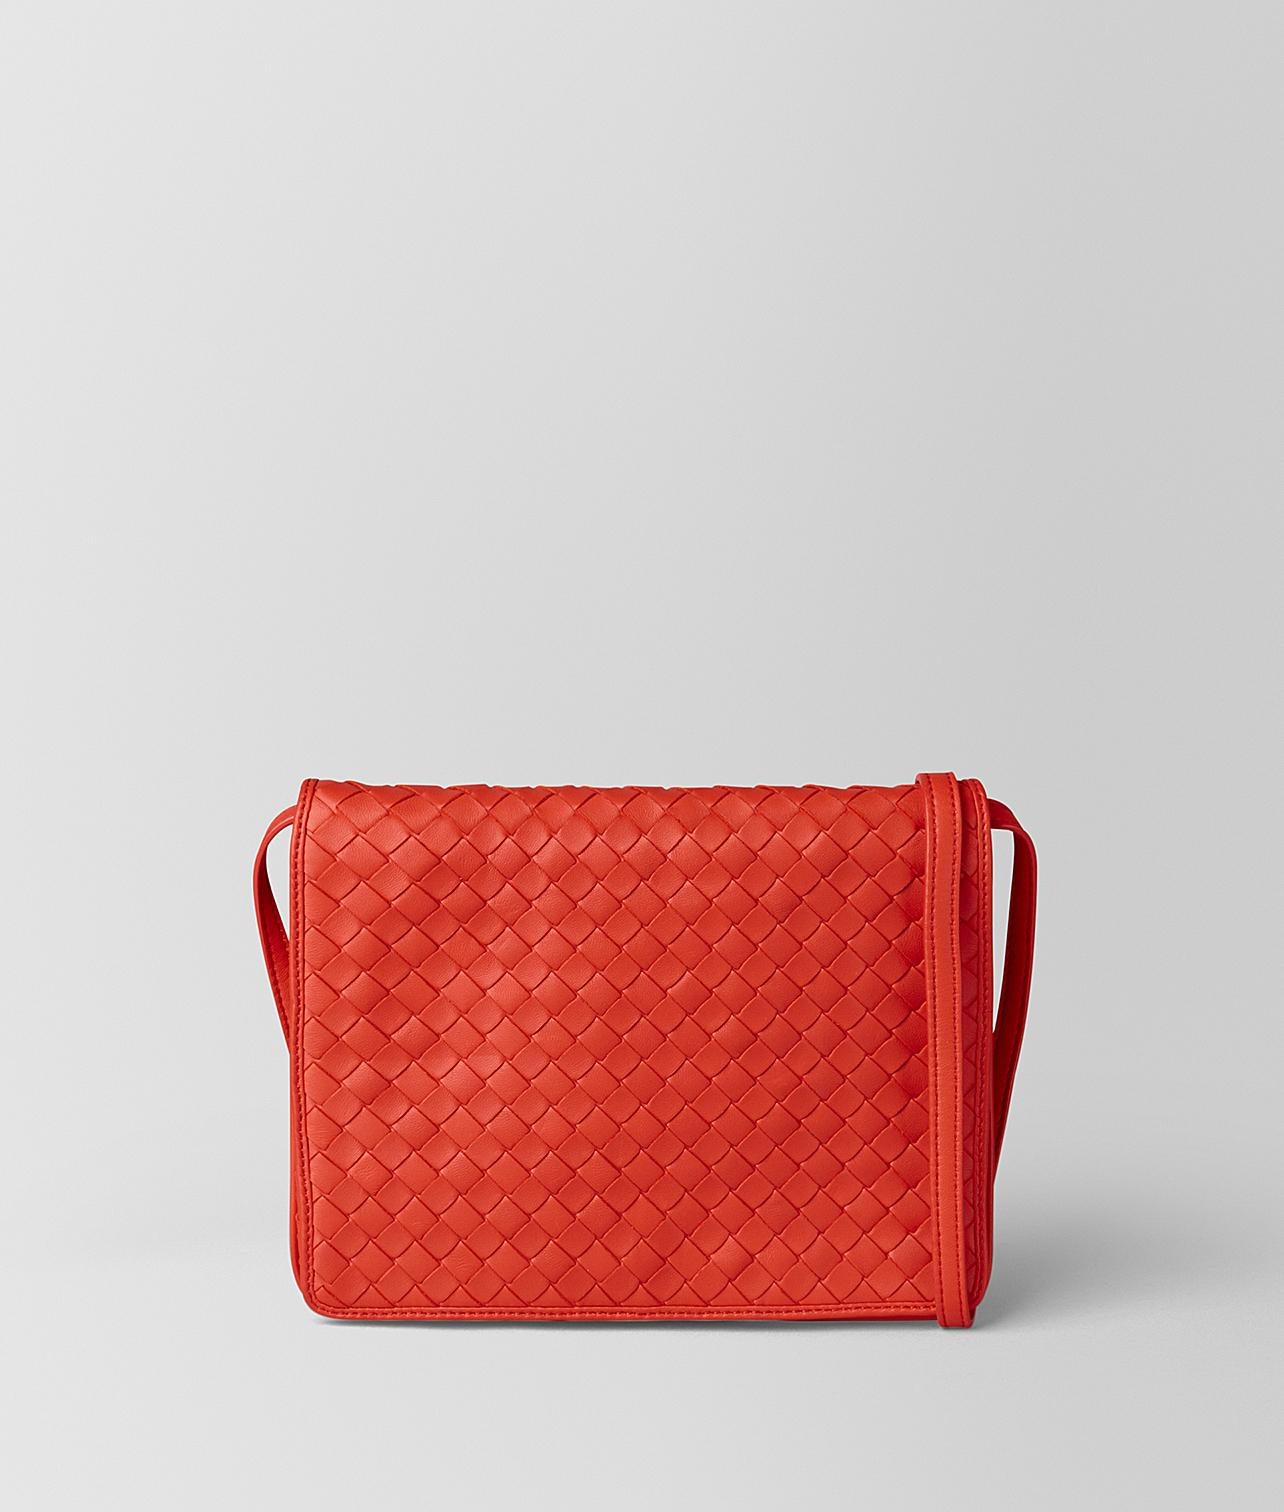 6c8c4cbc09f9 Bottega Veneta. Women s Red Crossbody Bag.  1